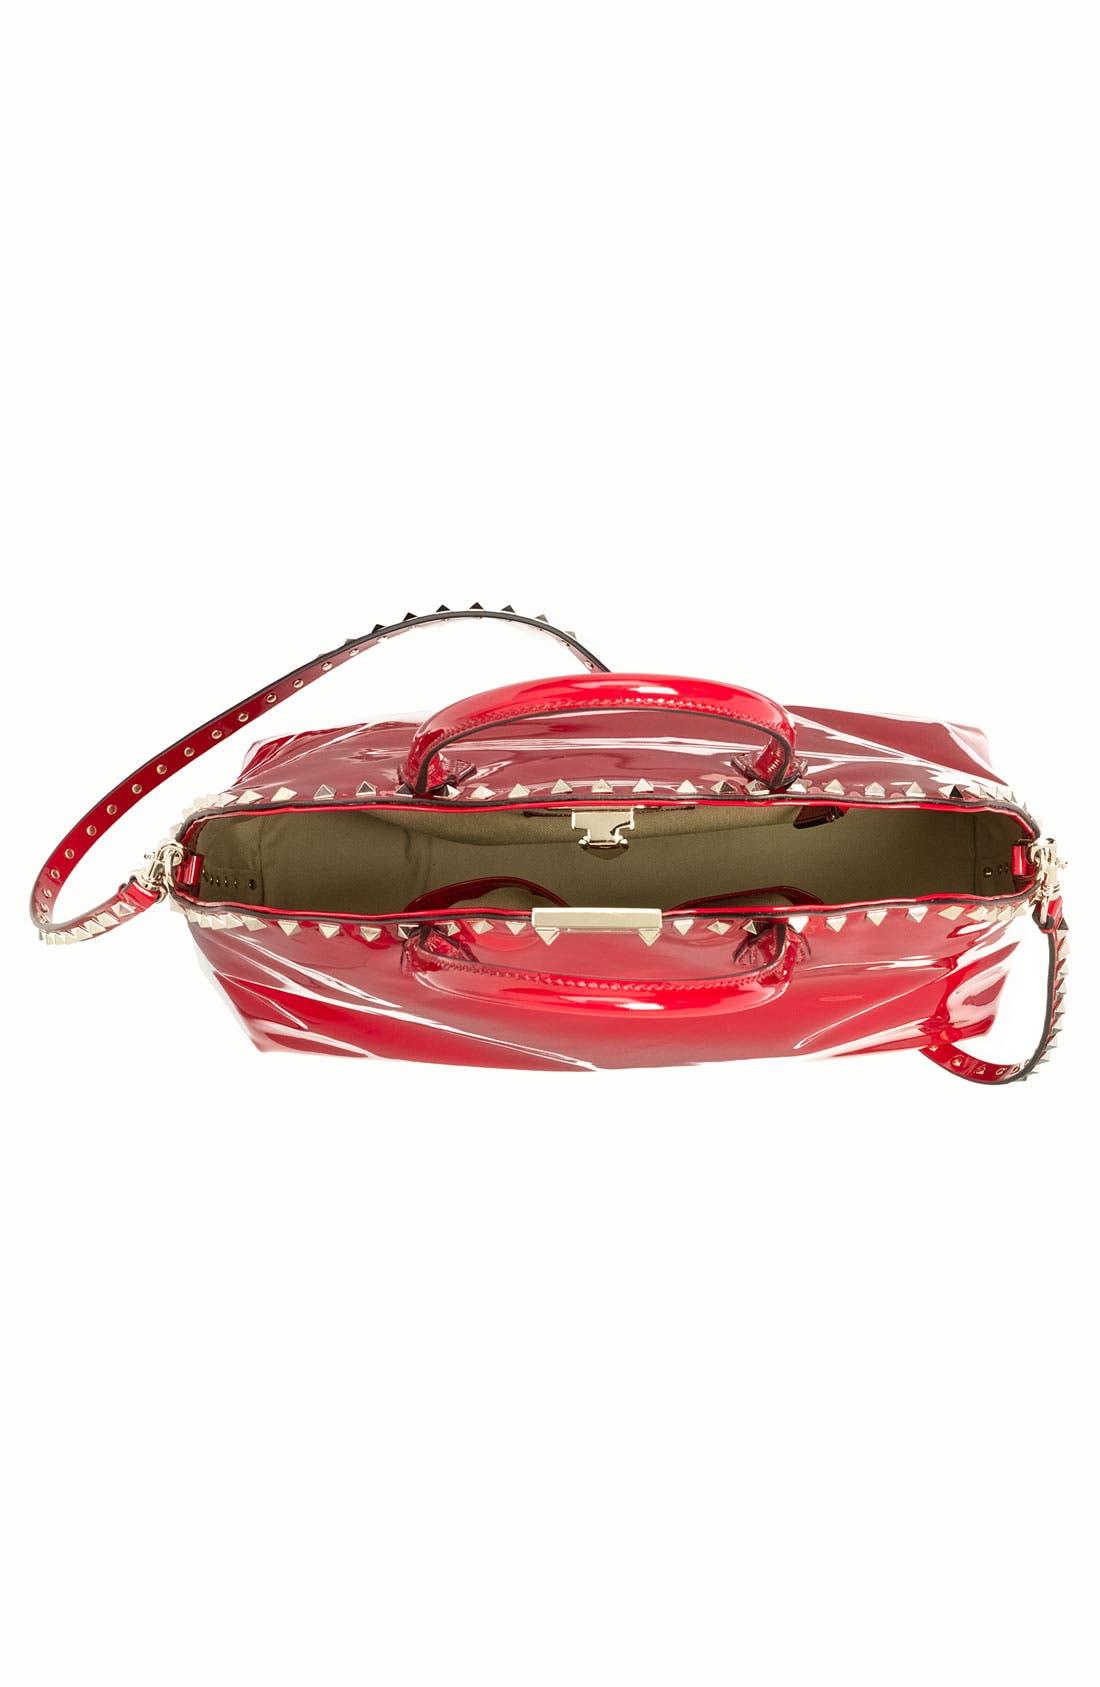 Alternate Image 3  - Valentino 'Rockstud' Patent Leather Dome Handbag